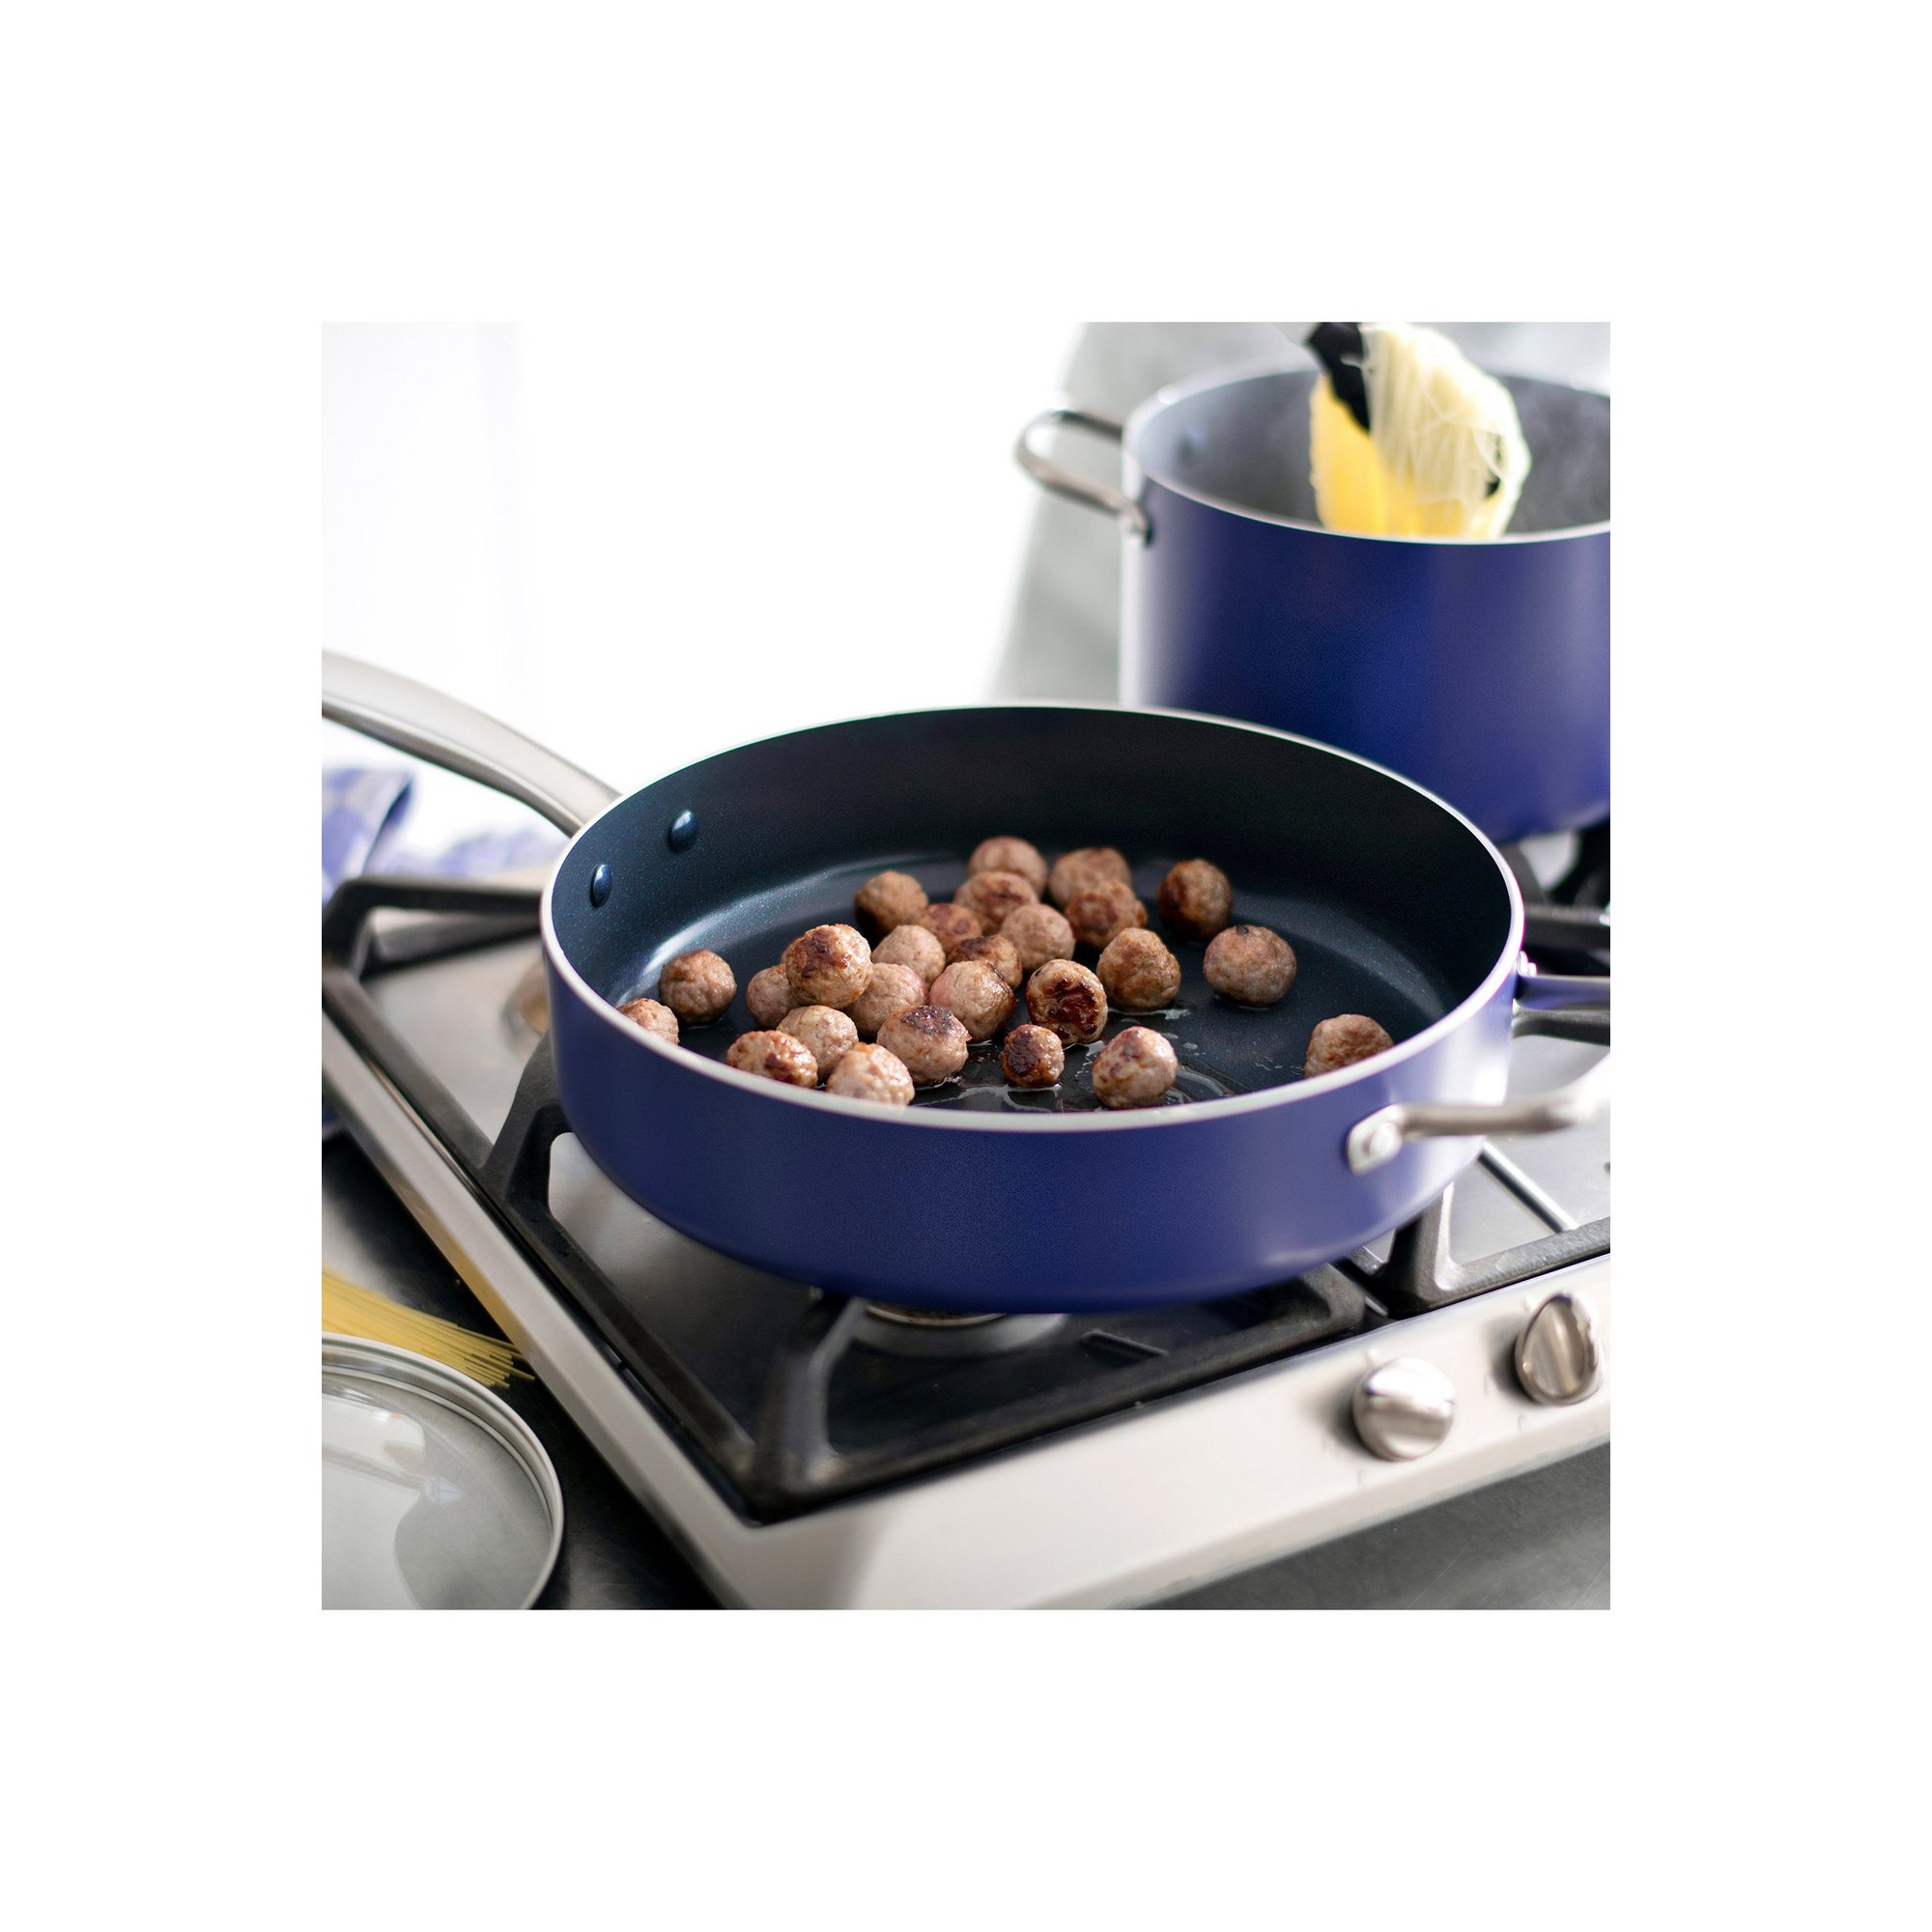 Image of Blue Diamond Non Stick 28cm Saute Pan